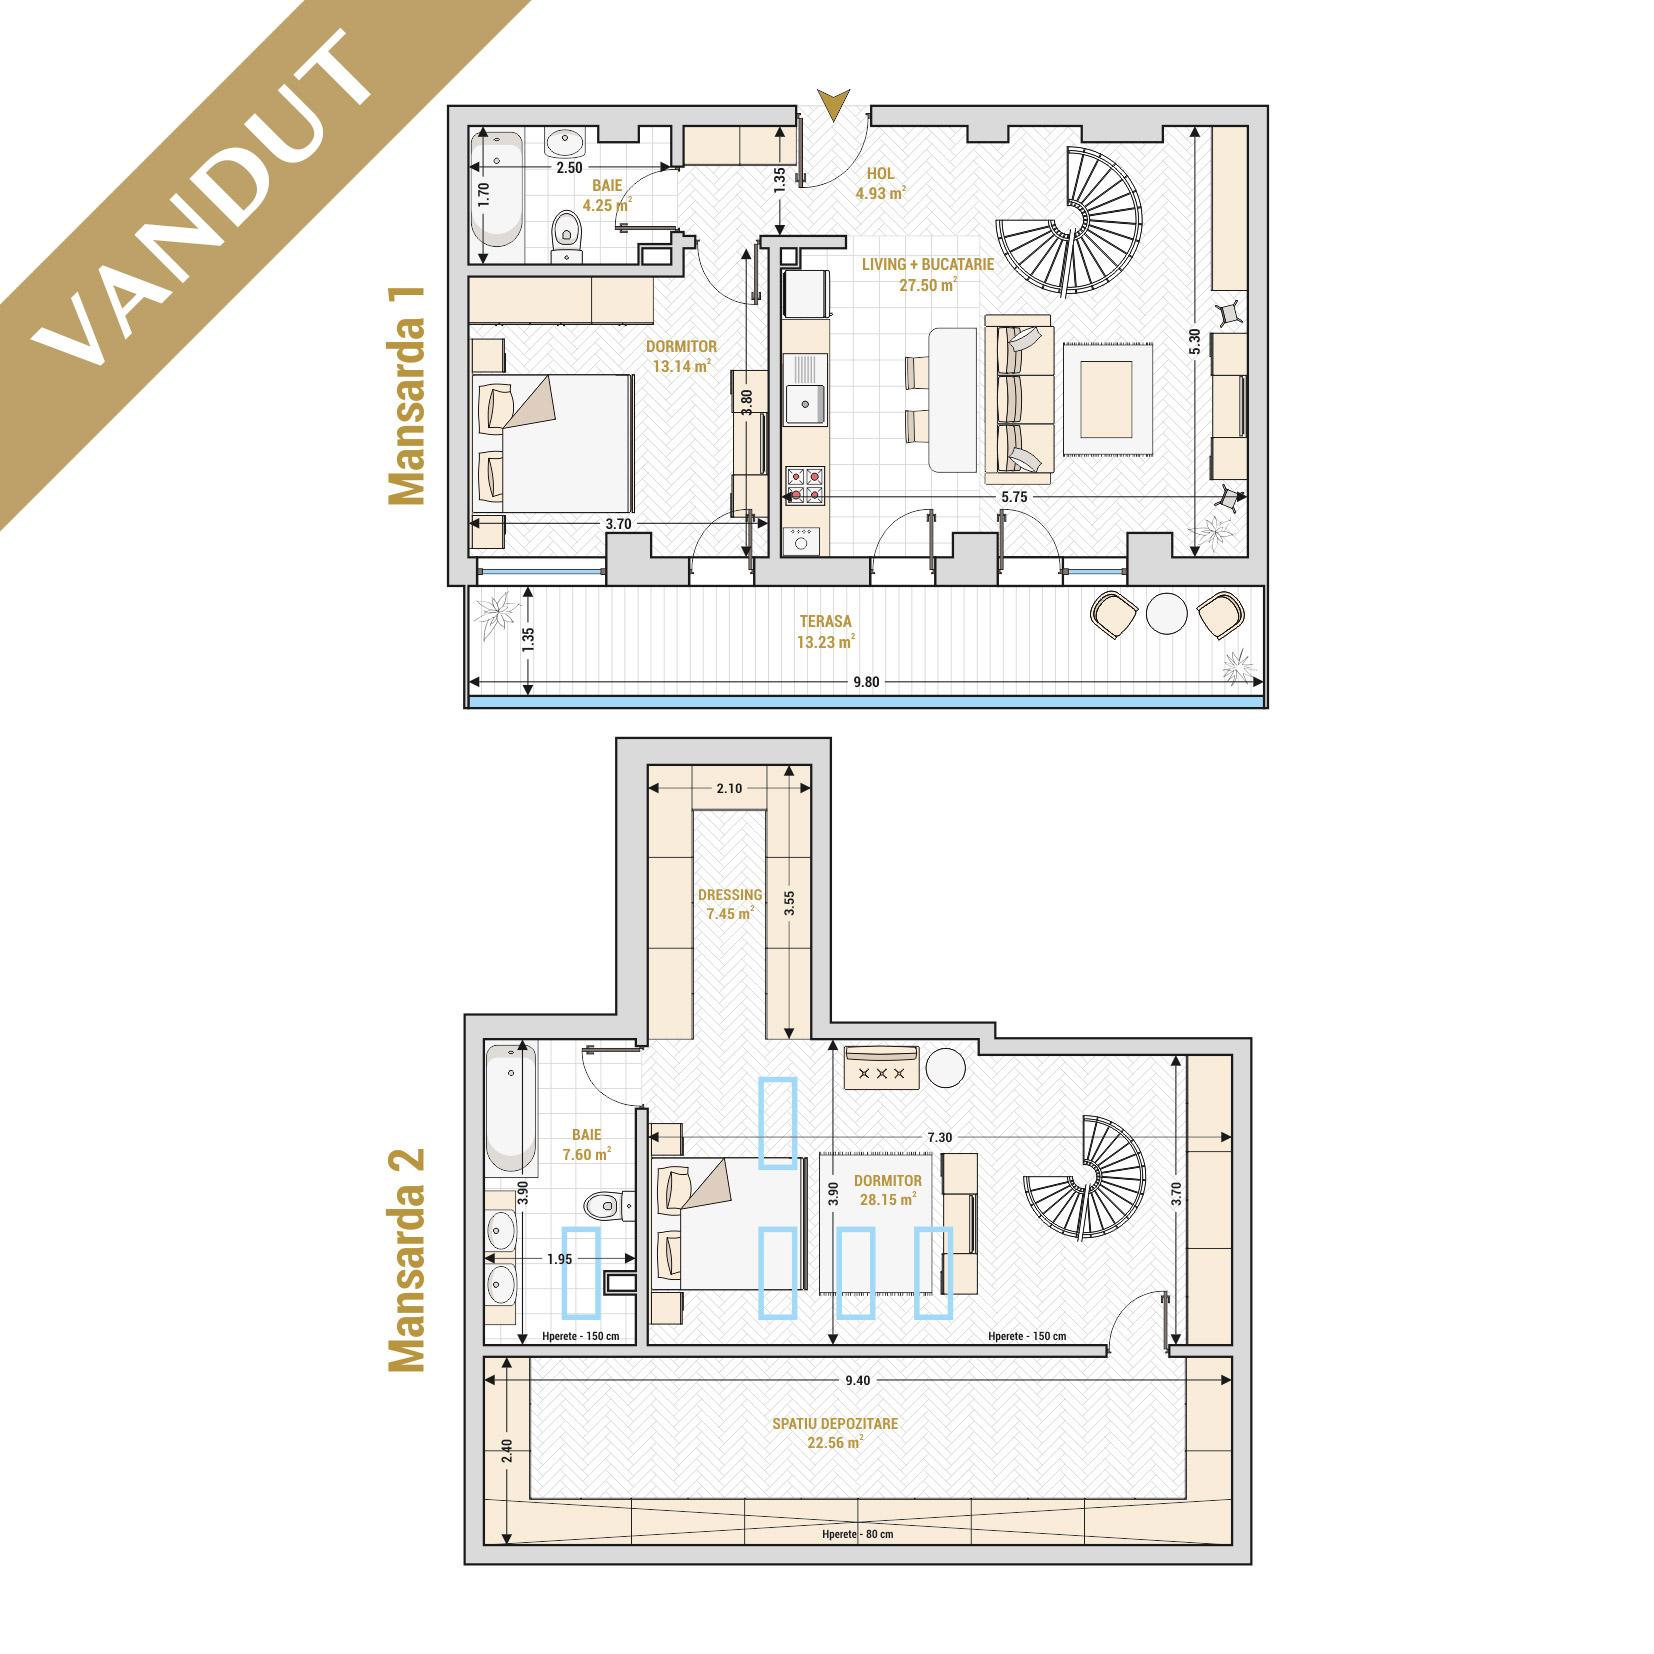 Duplex 3 camere de vanzare Bucuresti - Catedral Residence - Marriott, Piata Unirii, 13 Septembrie, Izvor - T2 - V